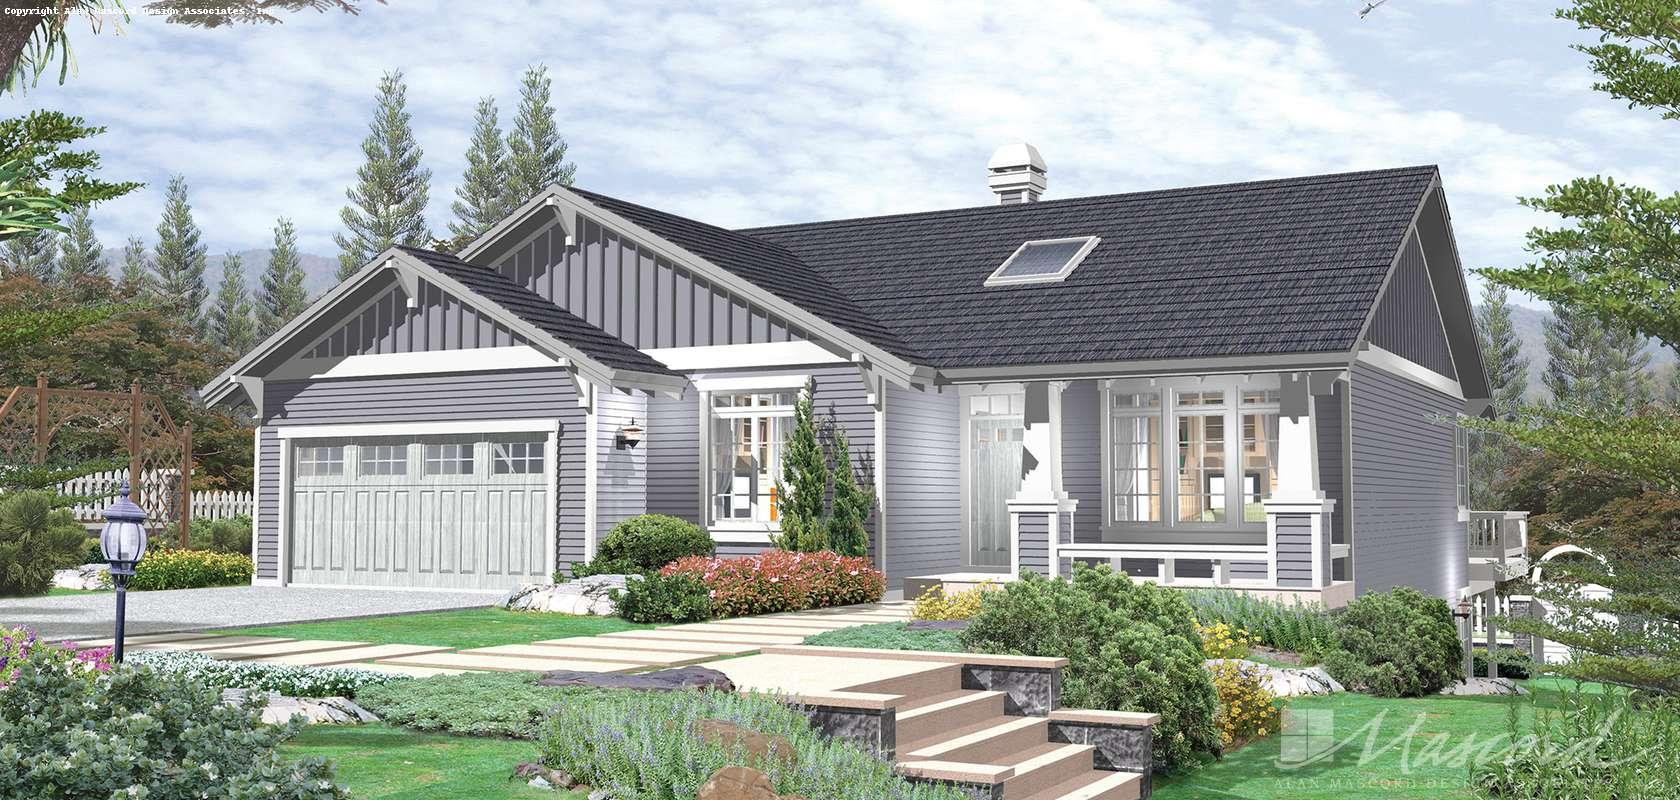 Mascord House Plan 1137: The Summerwood